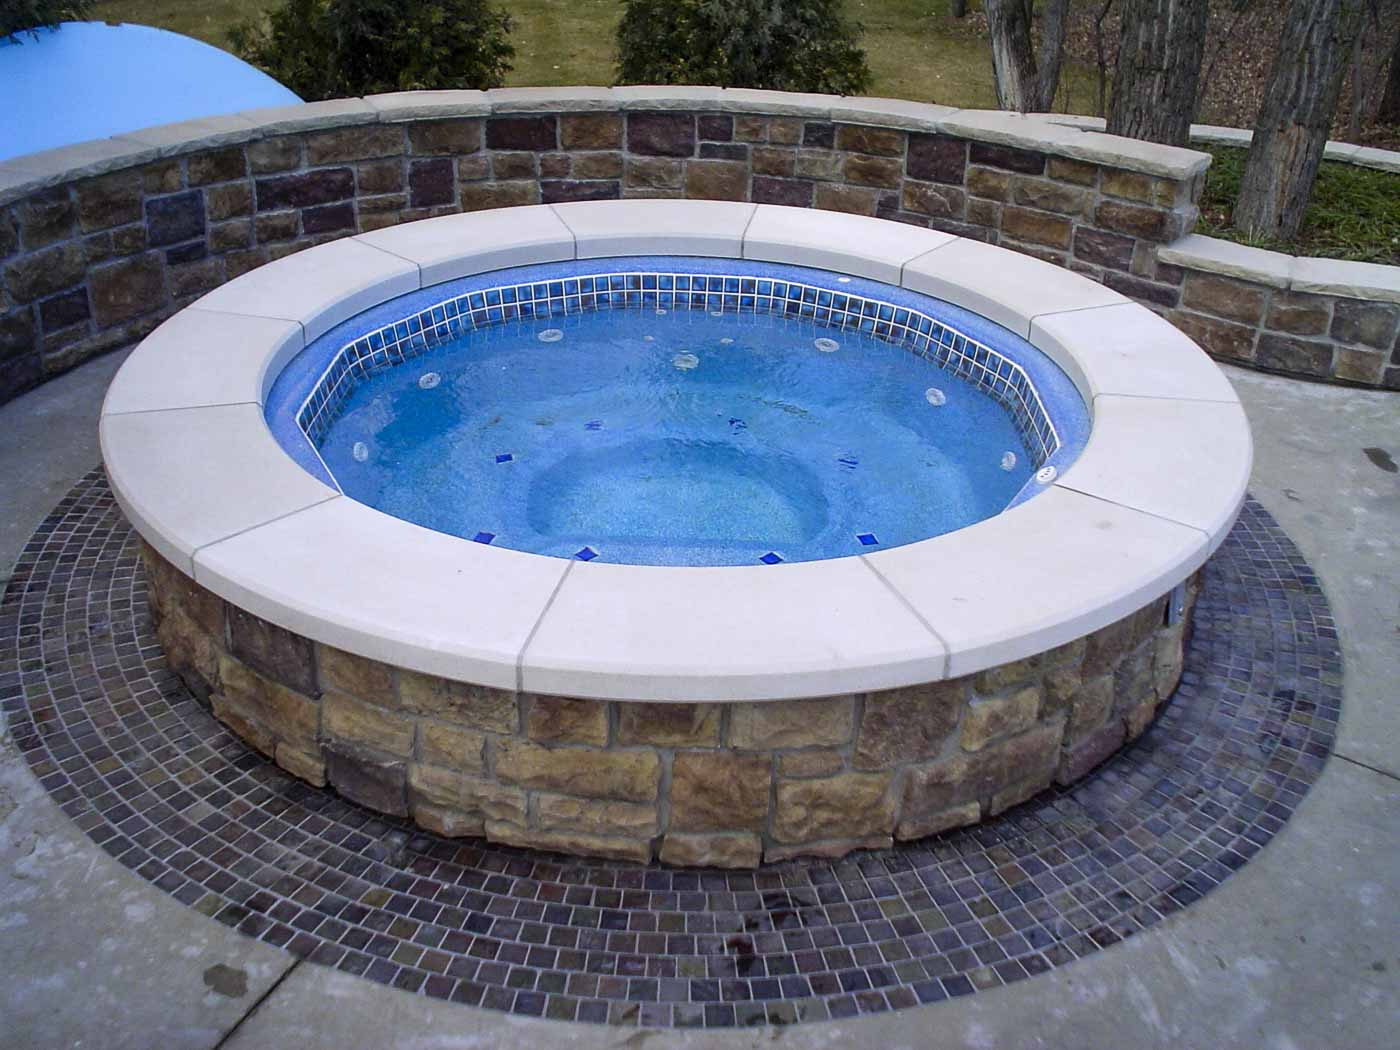 2009 Aquatech Gold Award Winning Fiberglass Pool - Omaha Pool Builder